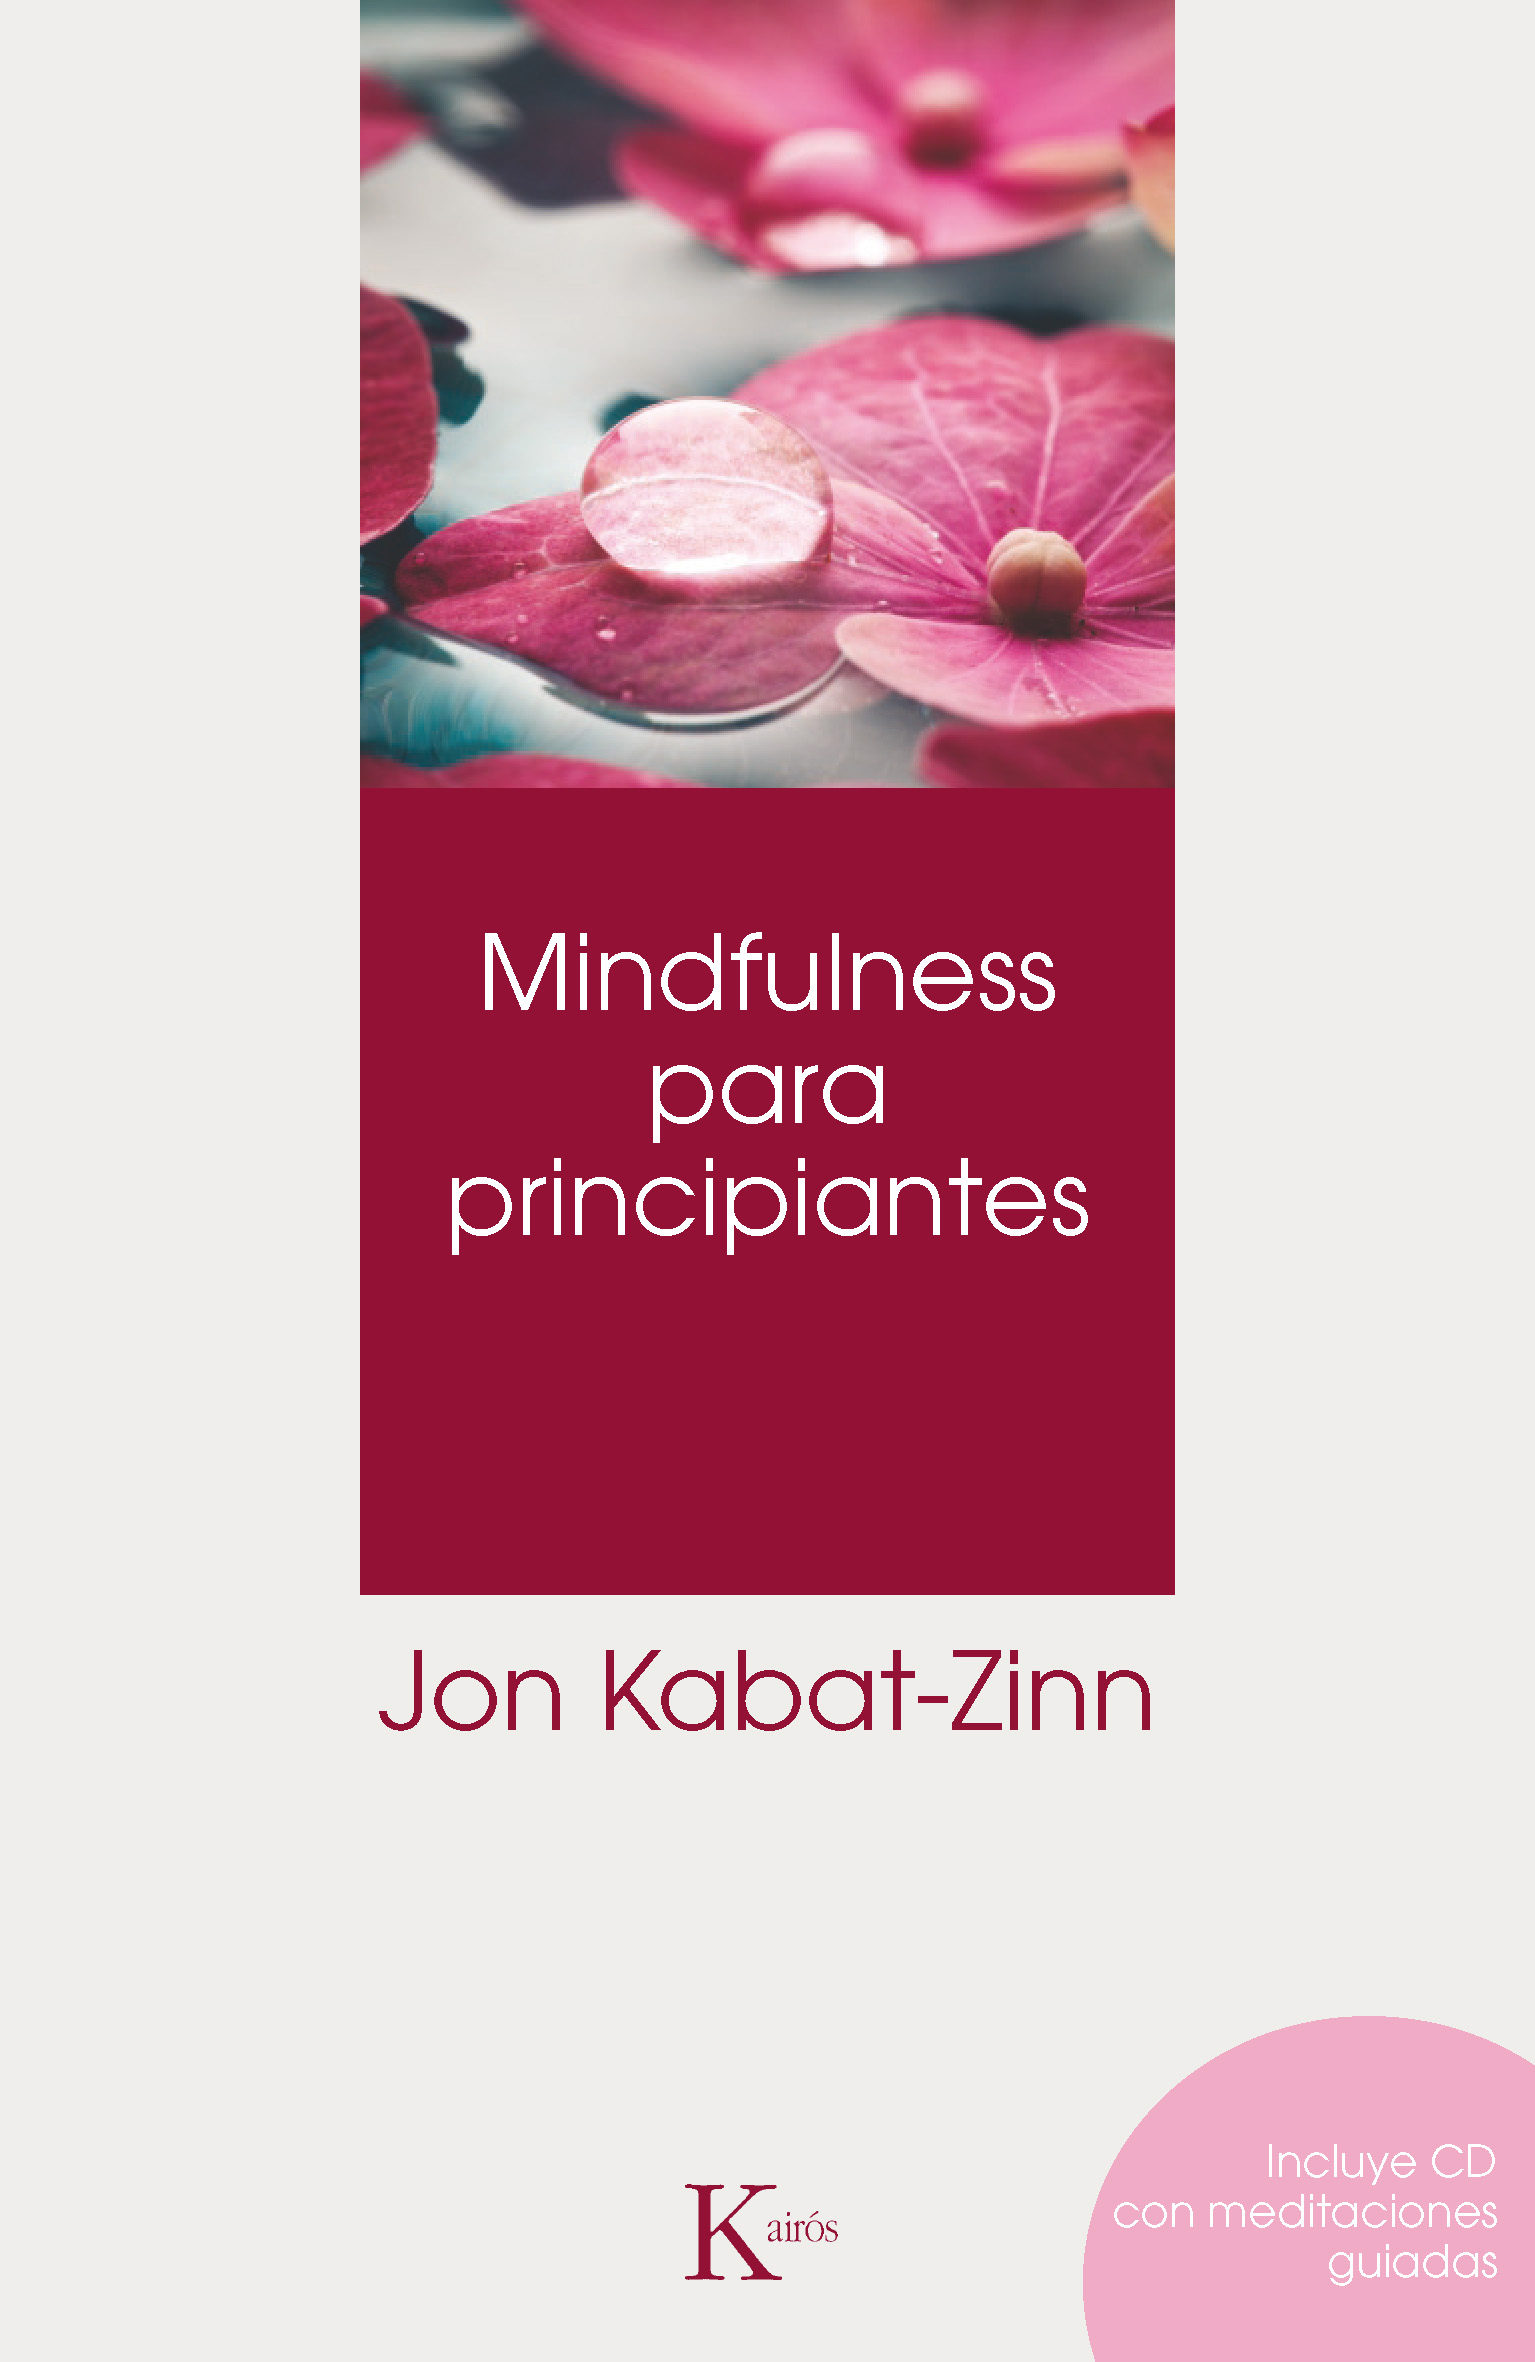 mindfulness-para-principiantes.jpg